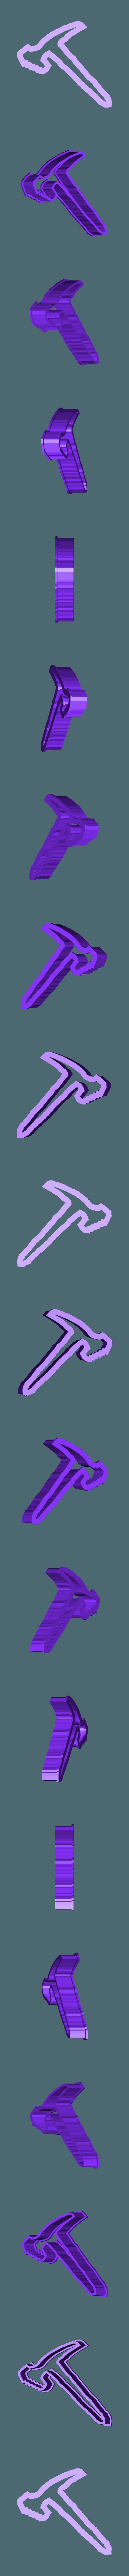 pico 1.stl Download STL file Fortnite Cookie Cutter Set • 3D printing template, davidruizo